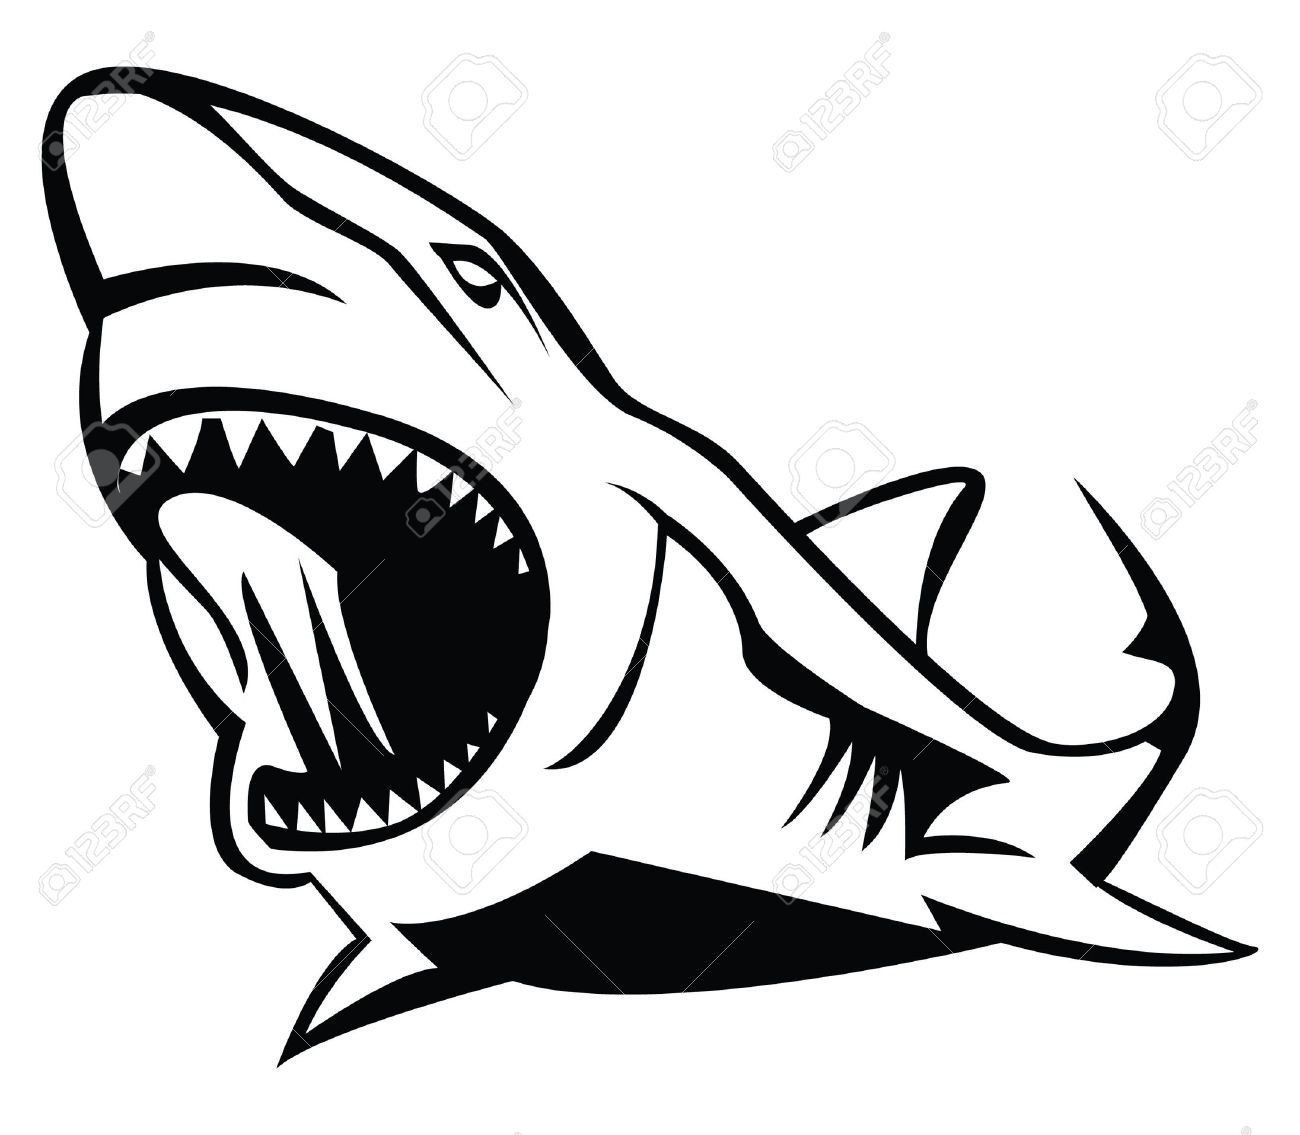 shark royalty free cliparts vectors and stock illustration